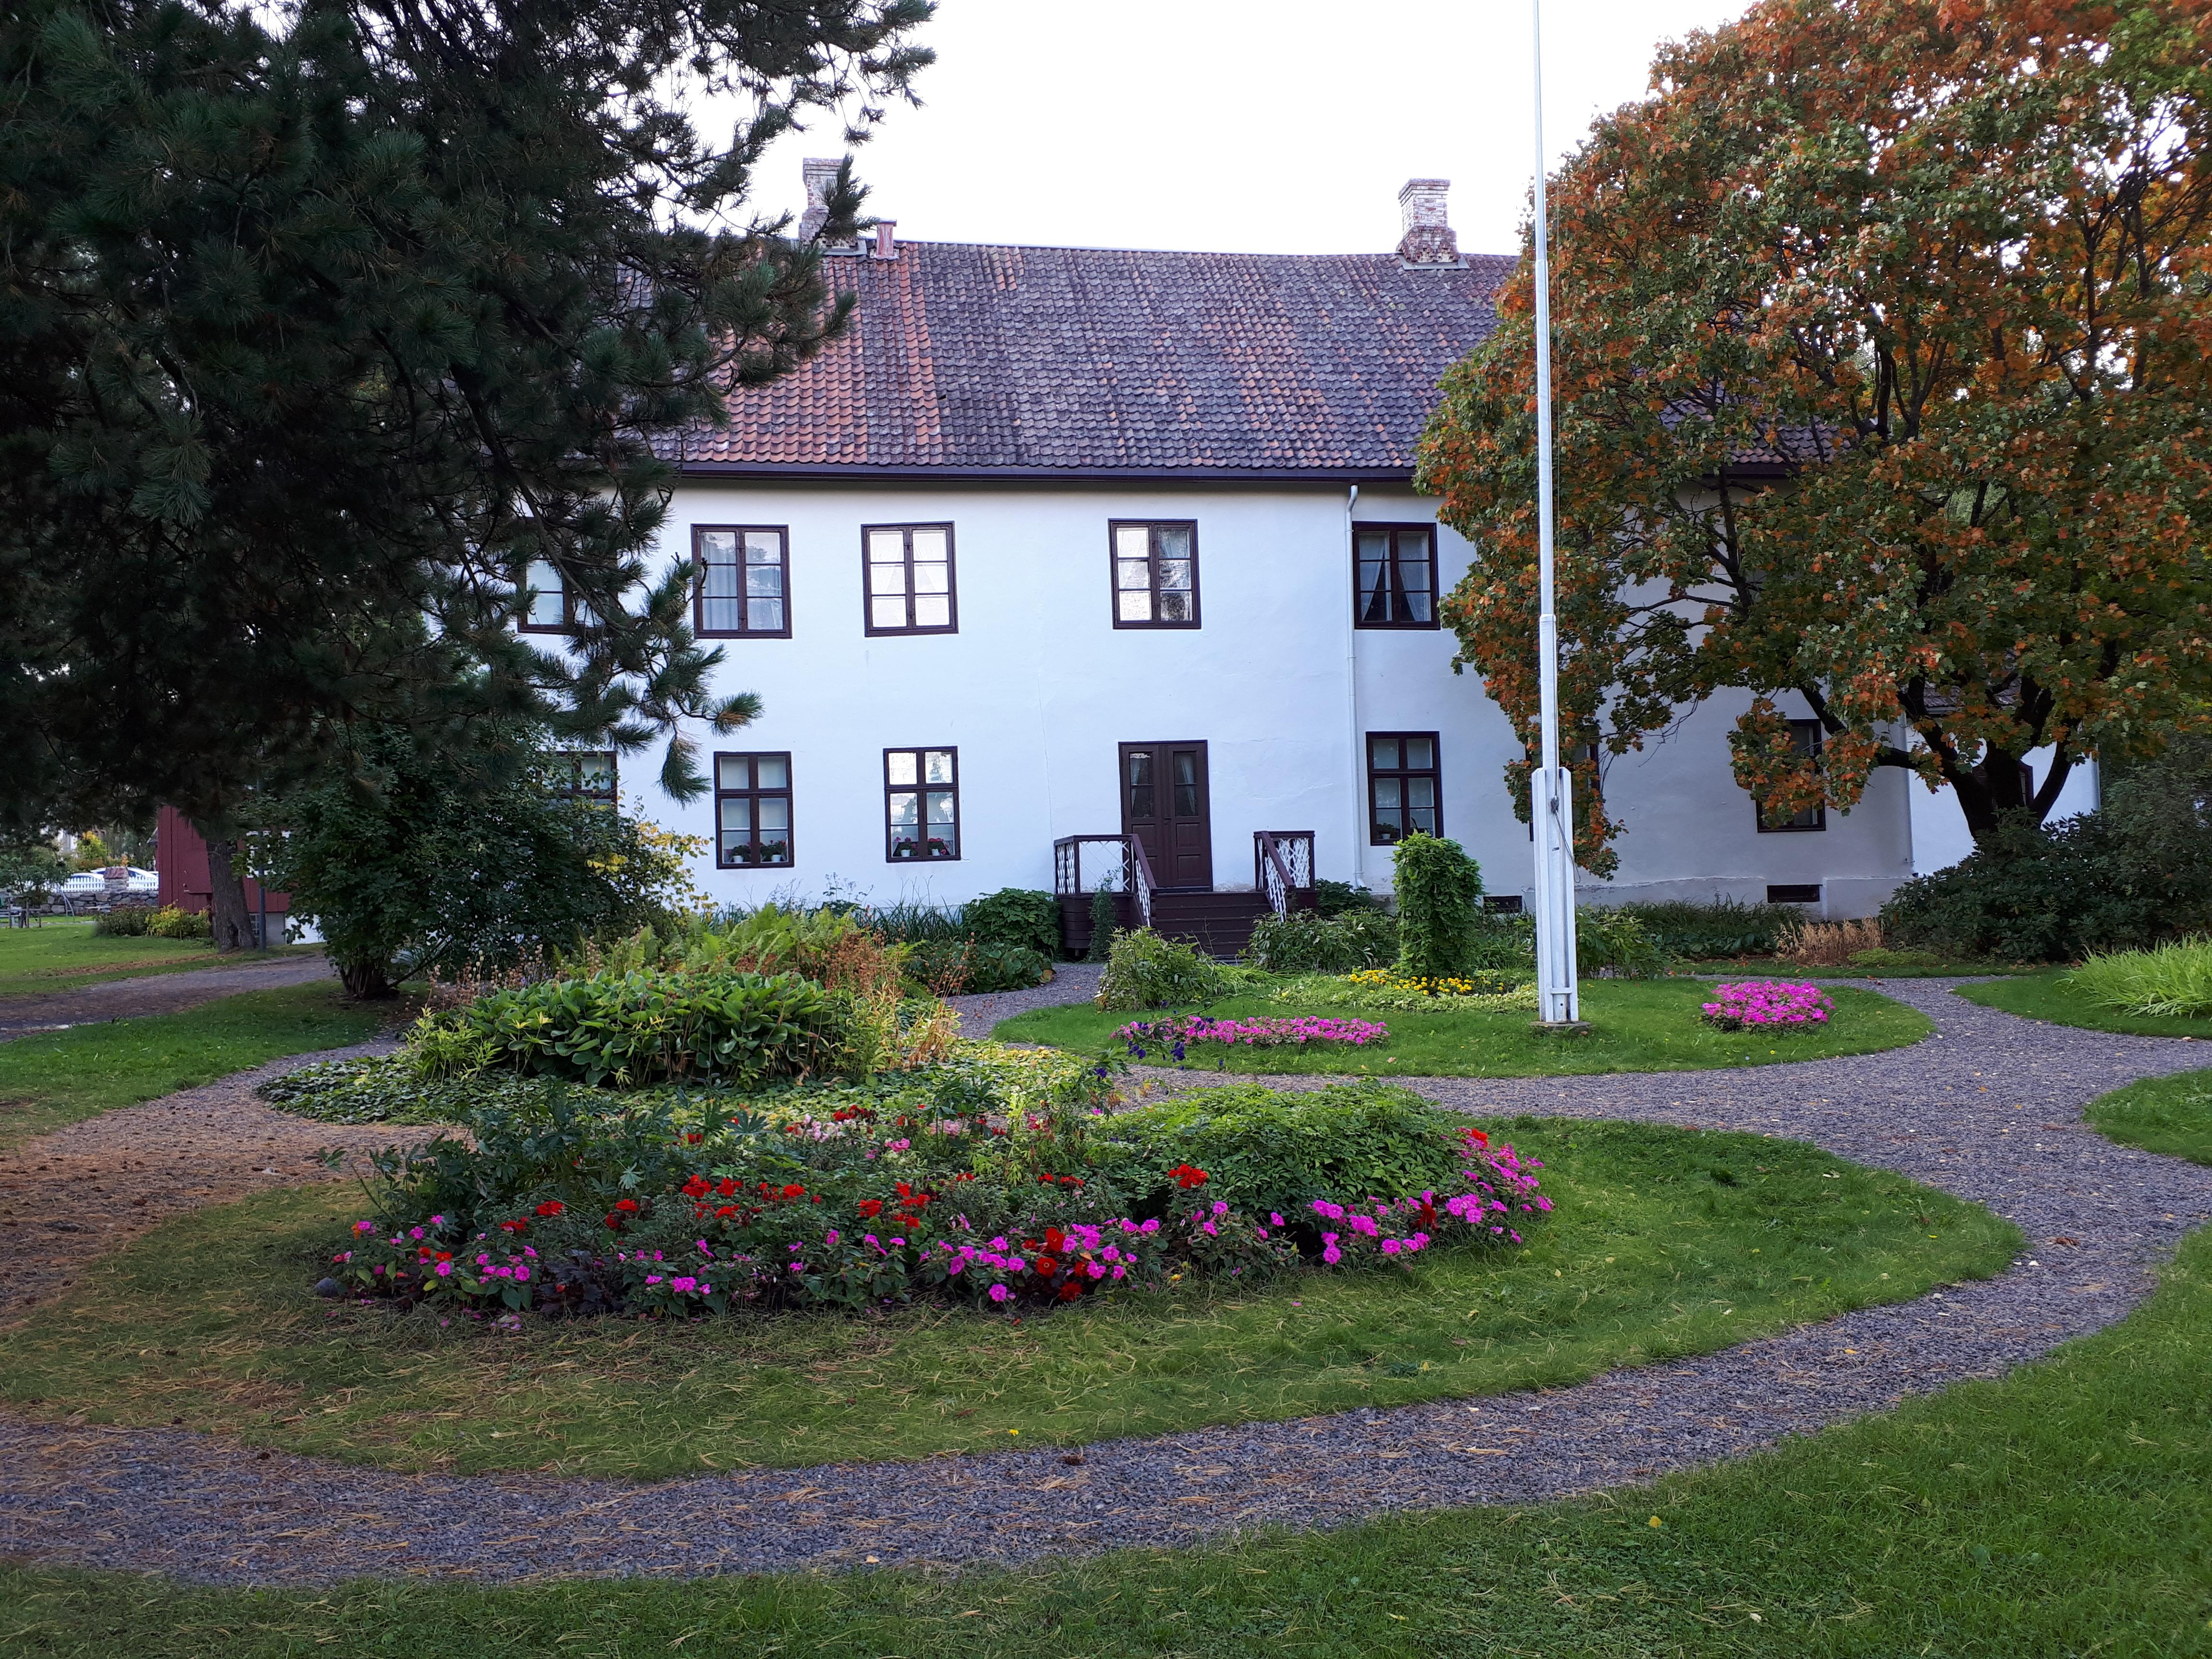 Intervju med landskapsarkitekt, prosjektleder og formidler ved Mjøsmuseet, Heidi Froknestad.